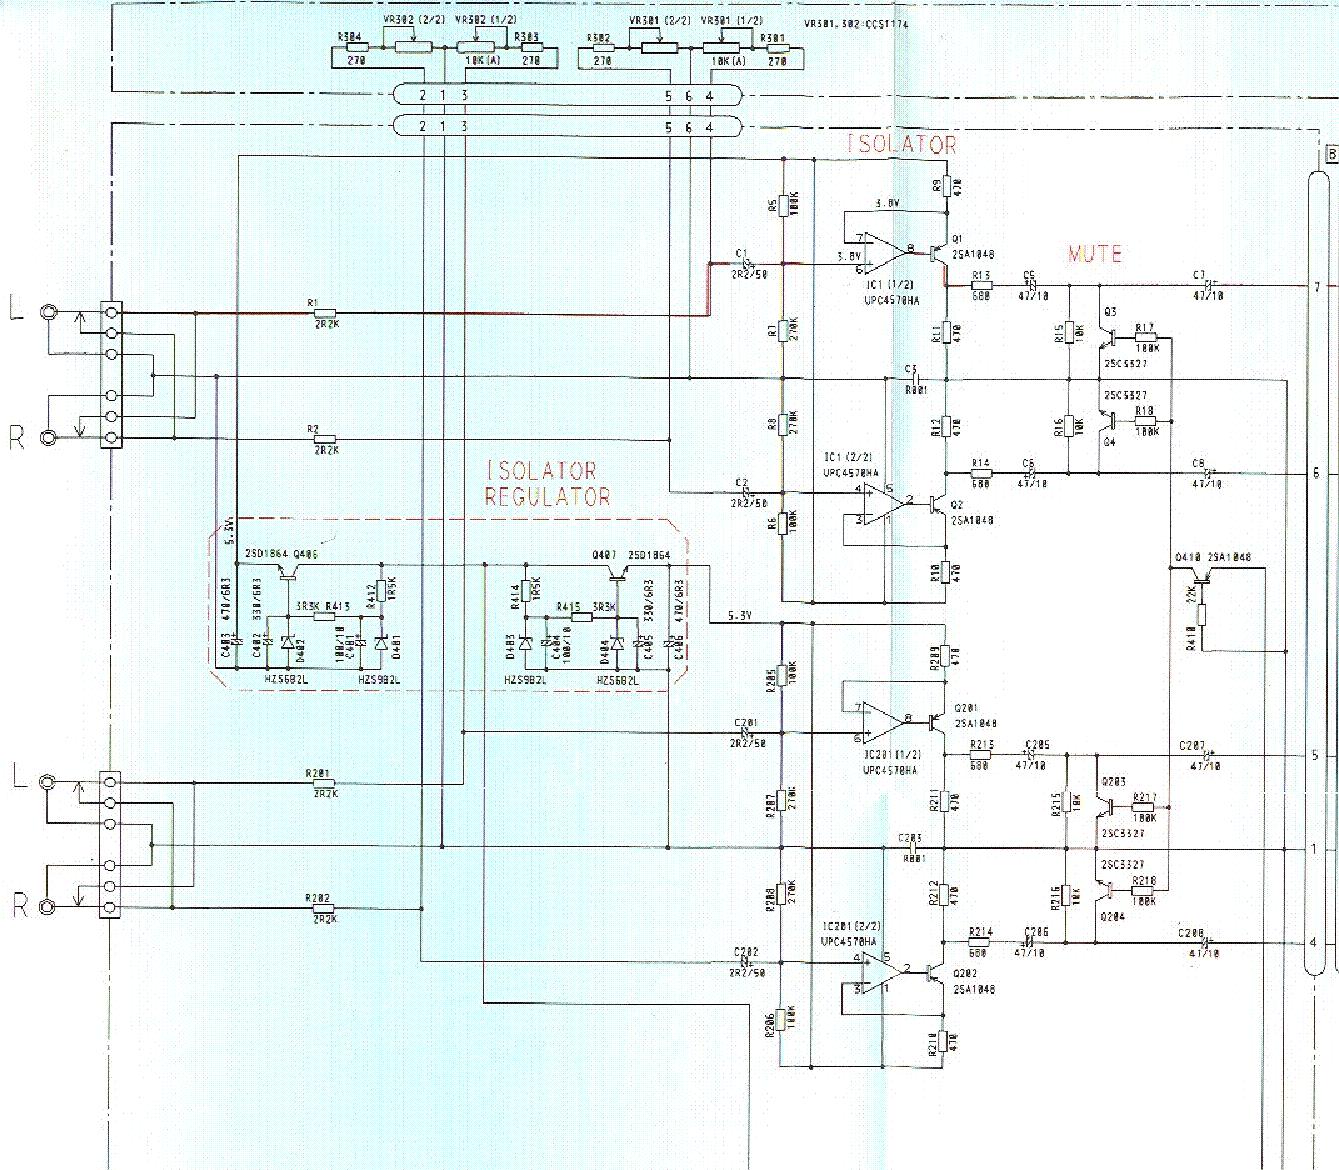 pioneer deh p47dh wiring diagram deh p47dh 14 pin wire pioneer gm 120 wiring diagram #7